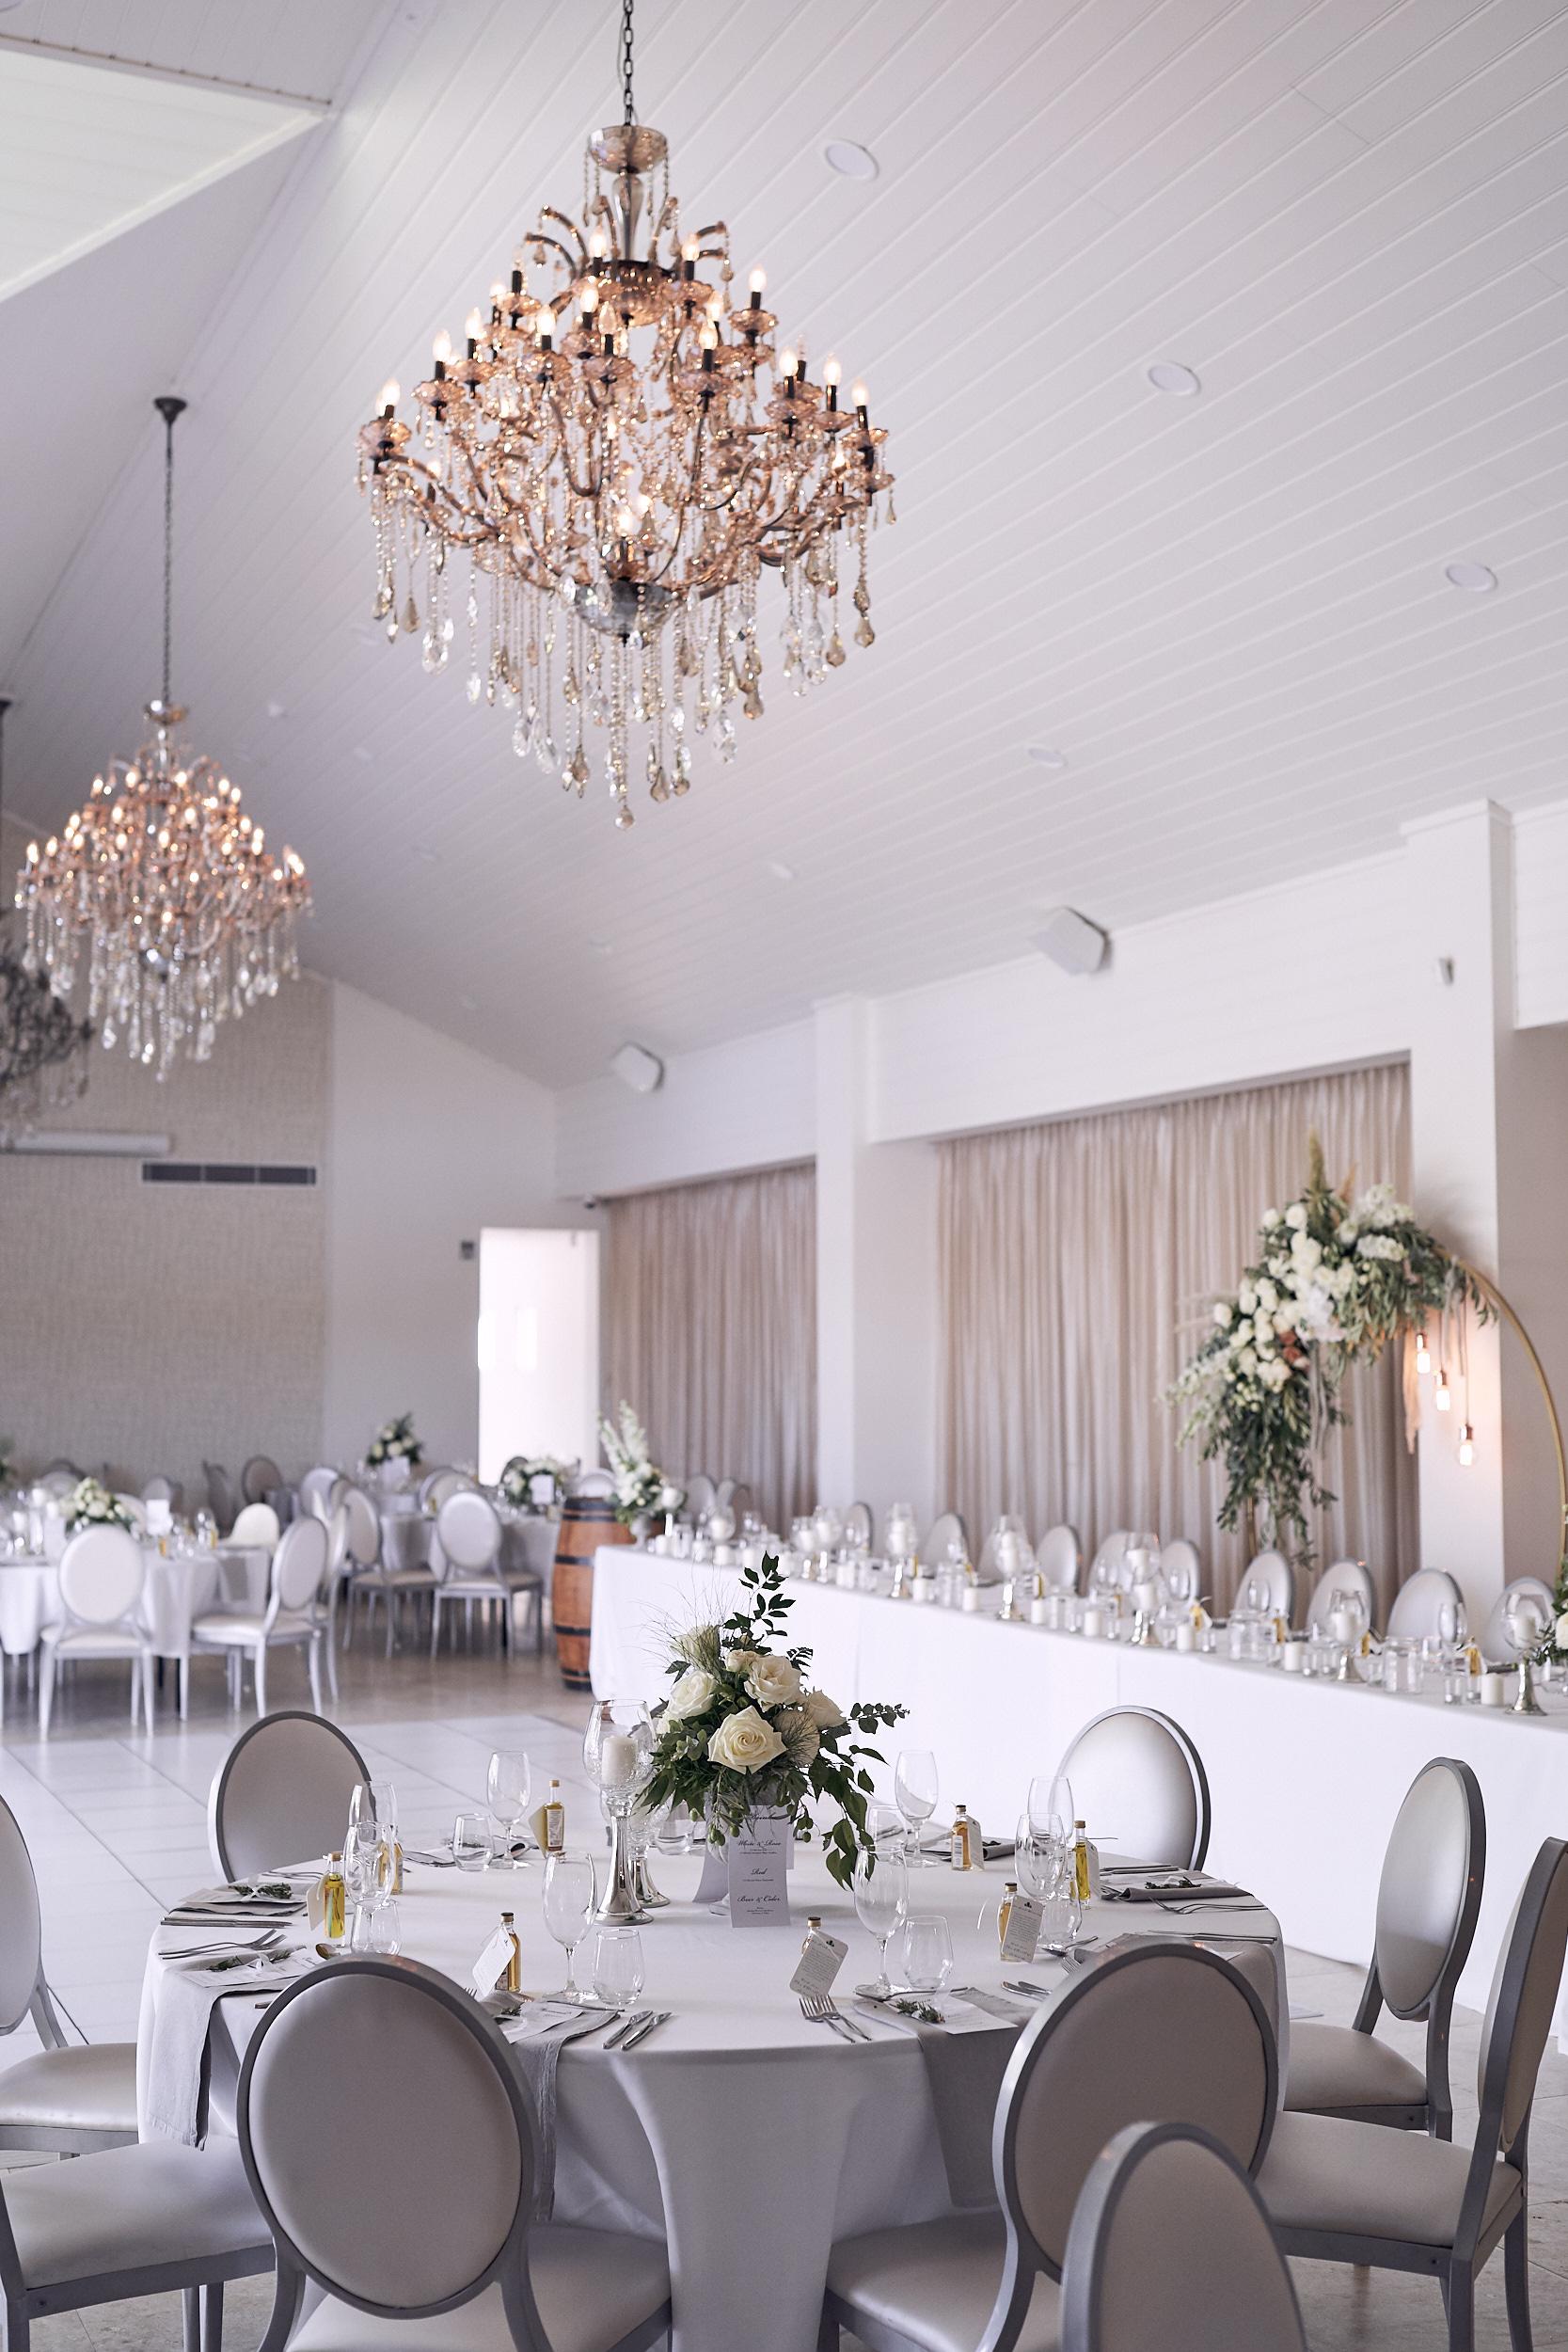 LR_JandA-aravina-wedding-LostInLove 351.jpg